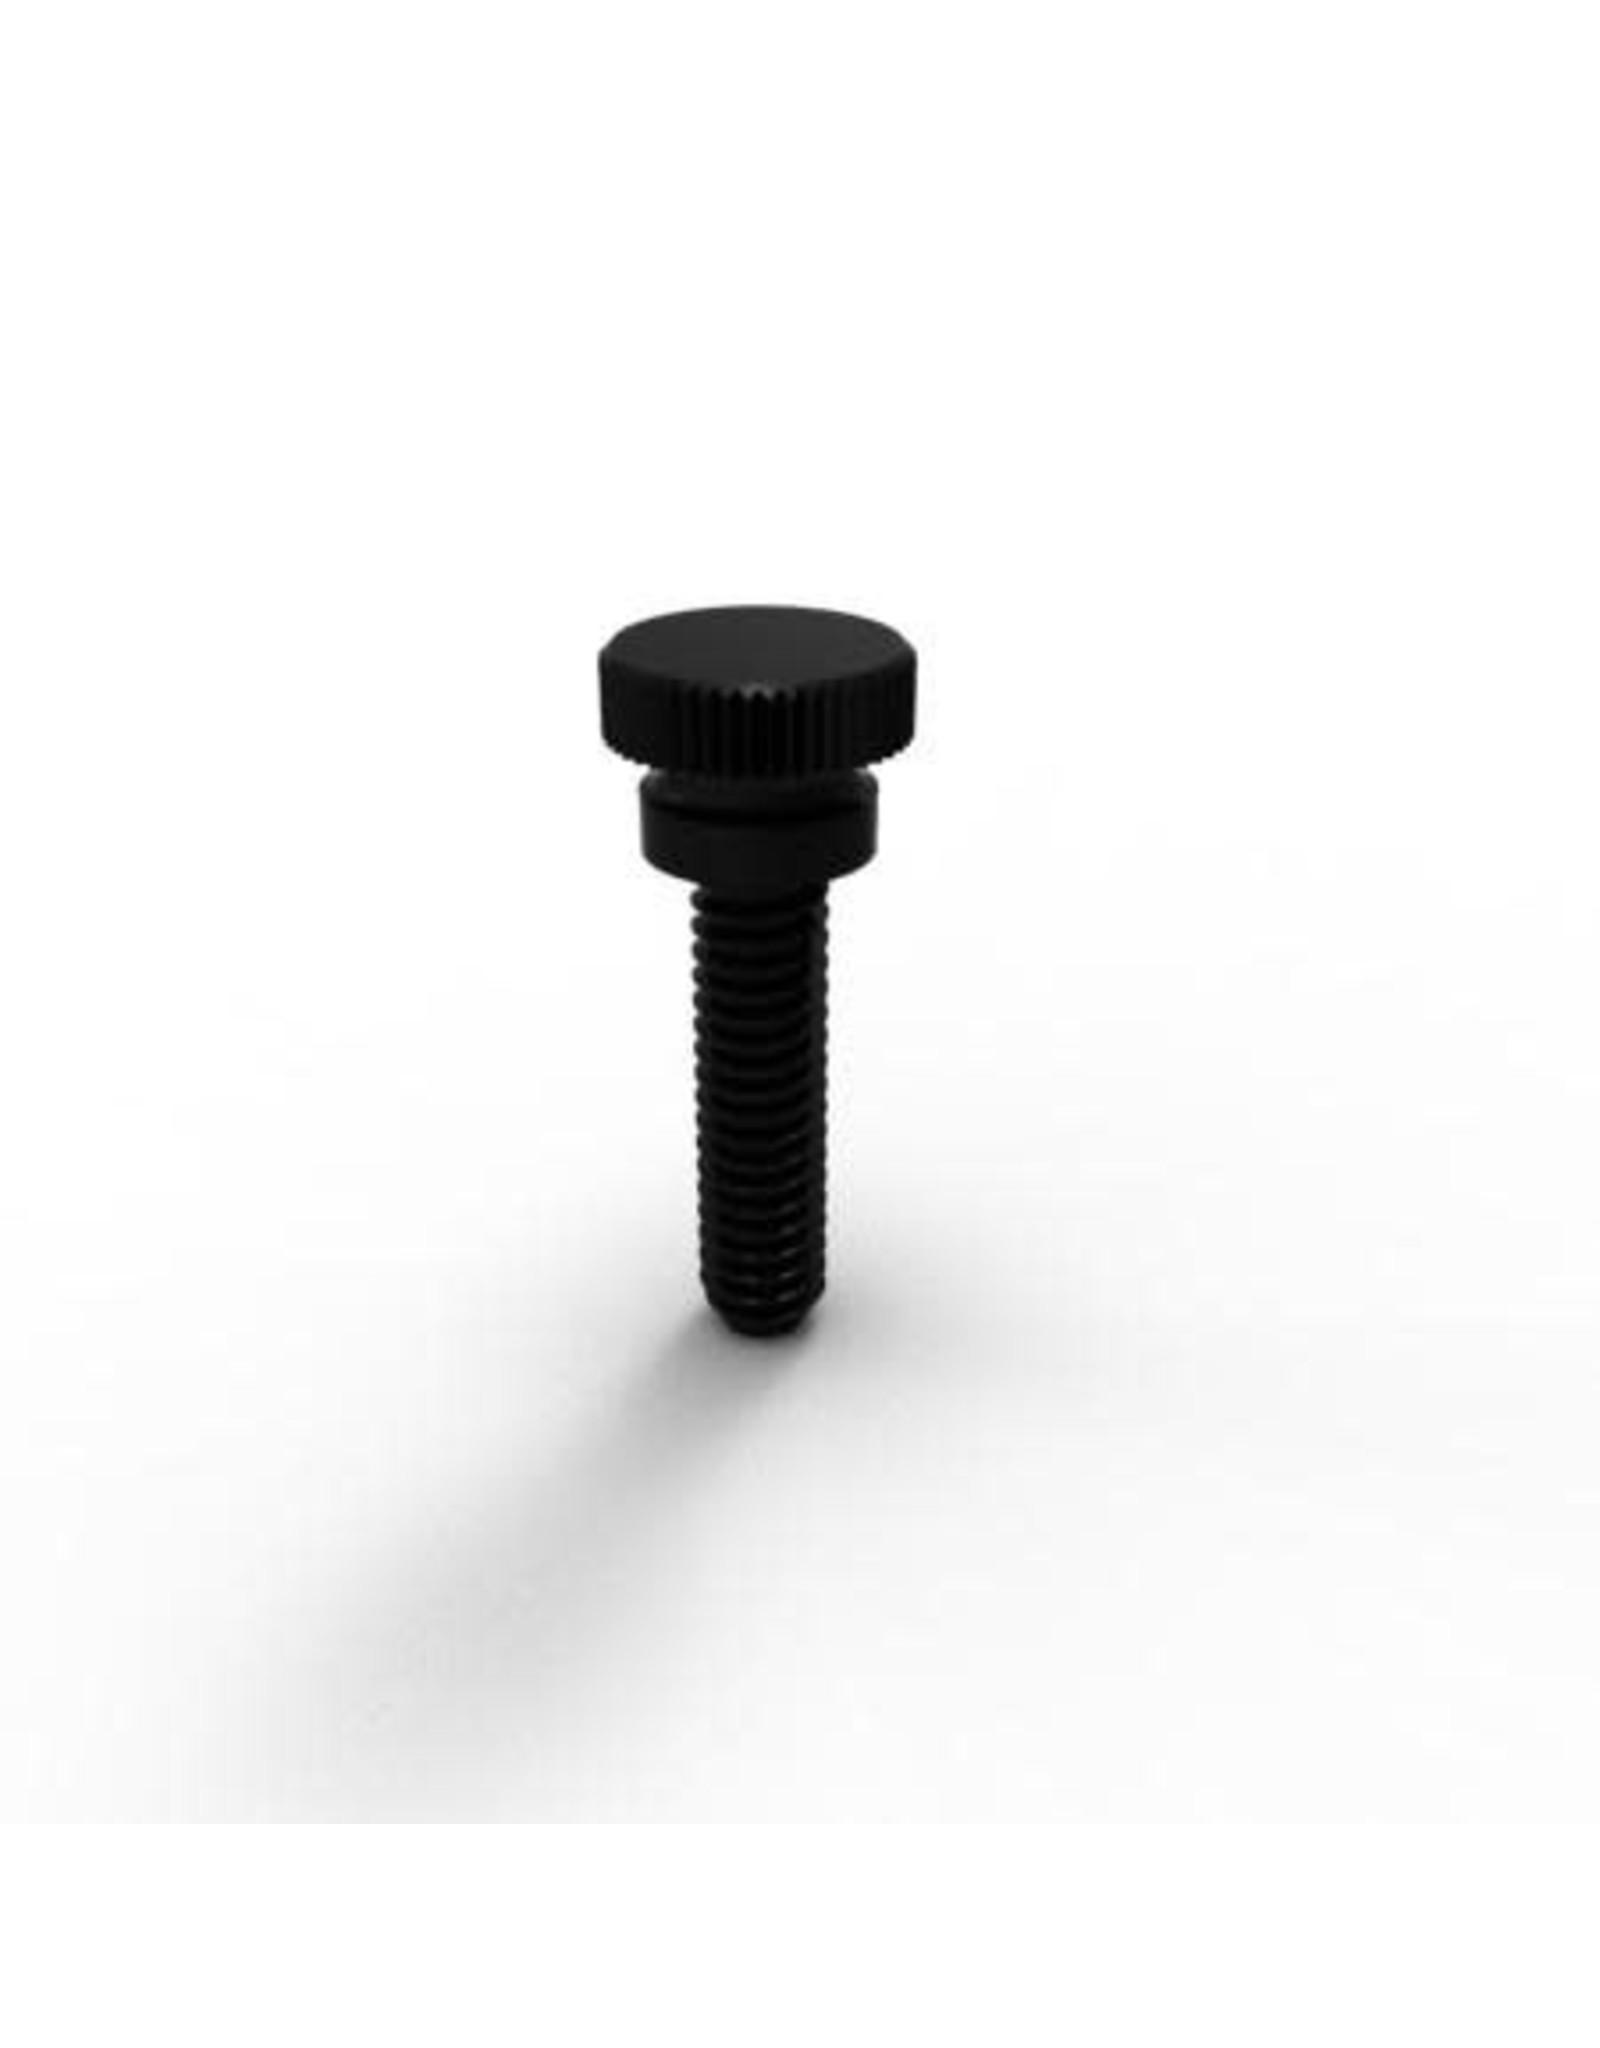 Nylon Thumbscrews 1/4-20 (set of 2)